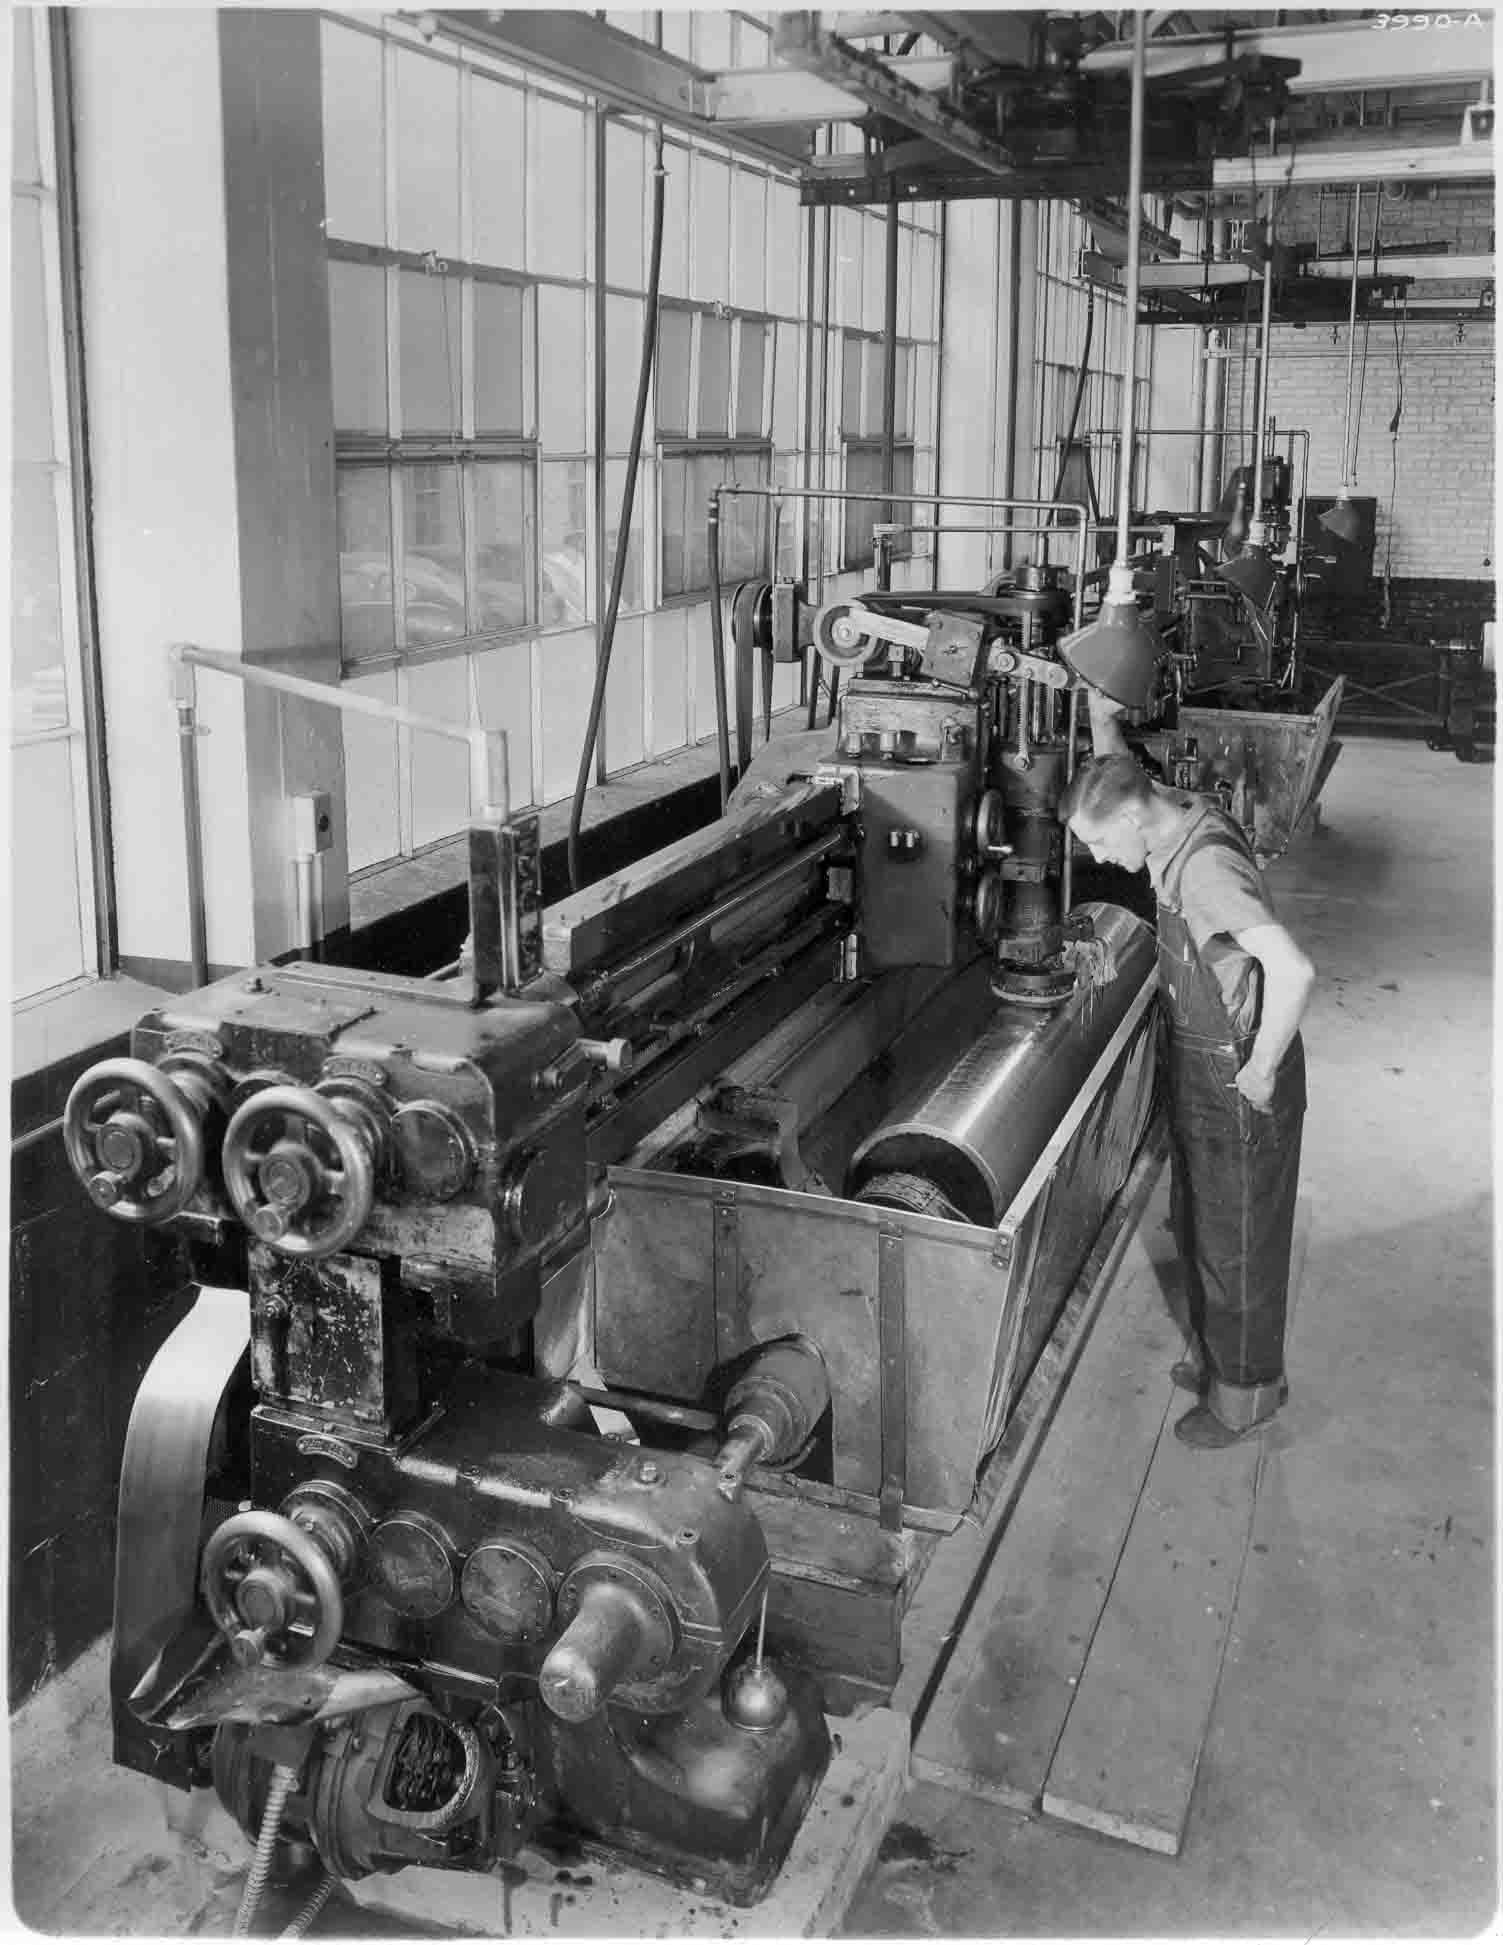 Titanic Engine Room Coal: KNAPP's BLACK BOOK